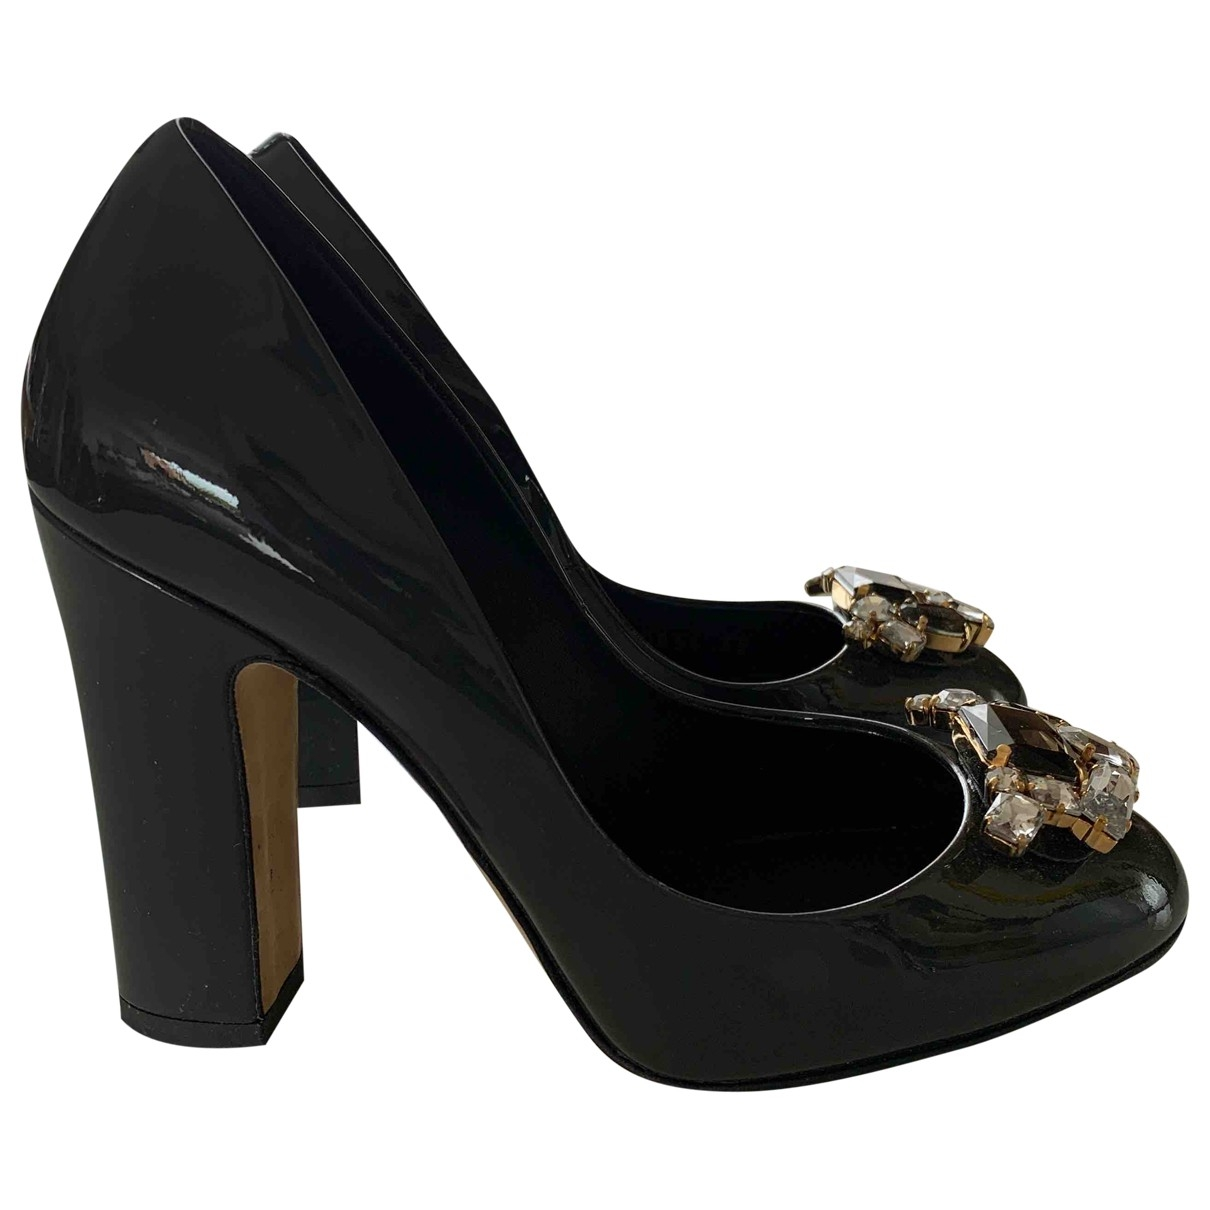 Dolce & Gabbana \N Pumps in  Grau Lackleder